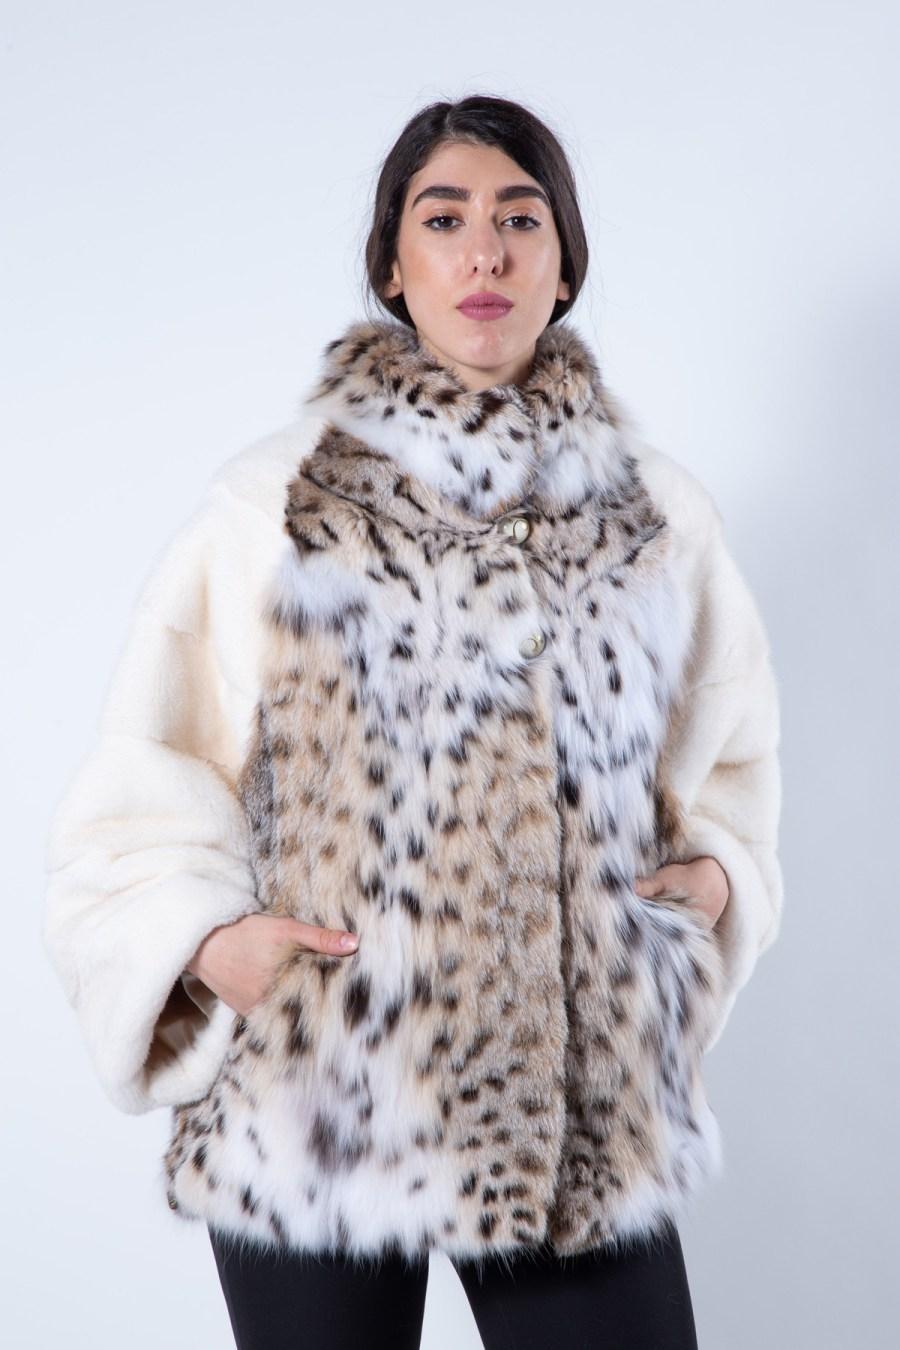 Pearl Mink and Bobcat fur Jacket | Пальто из меха норки цвета «жемчуг» и рыжей рыси - Sarigianni Furs